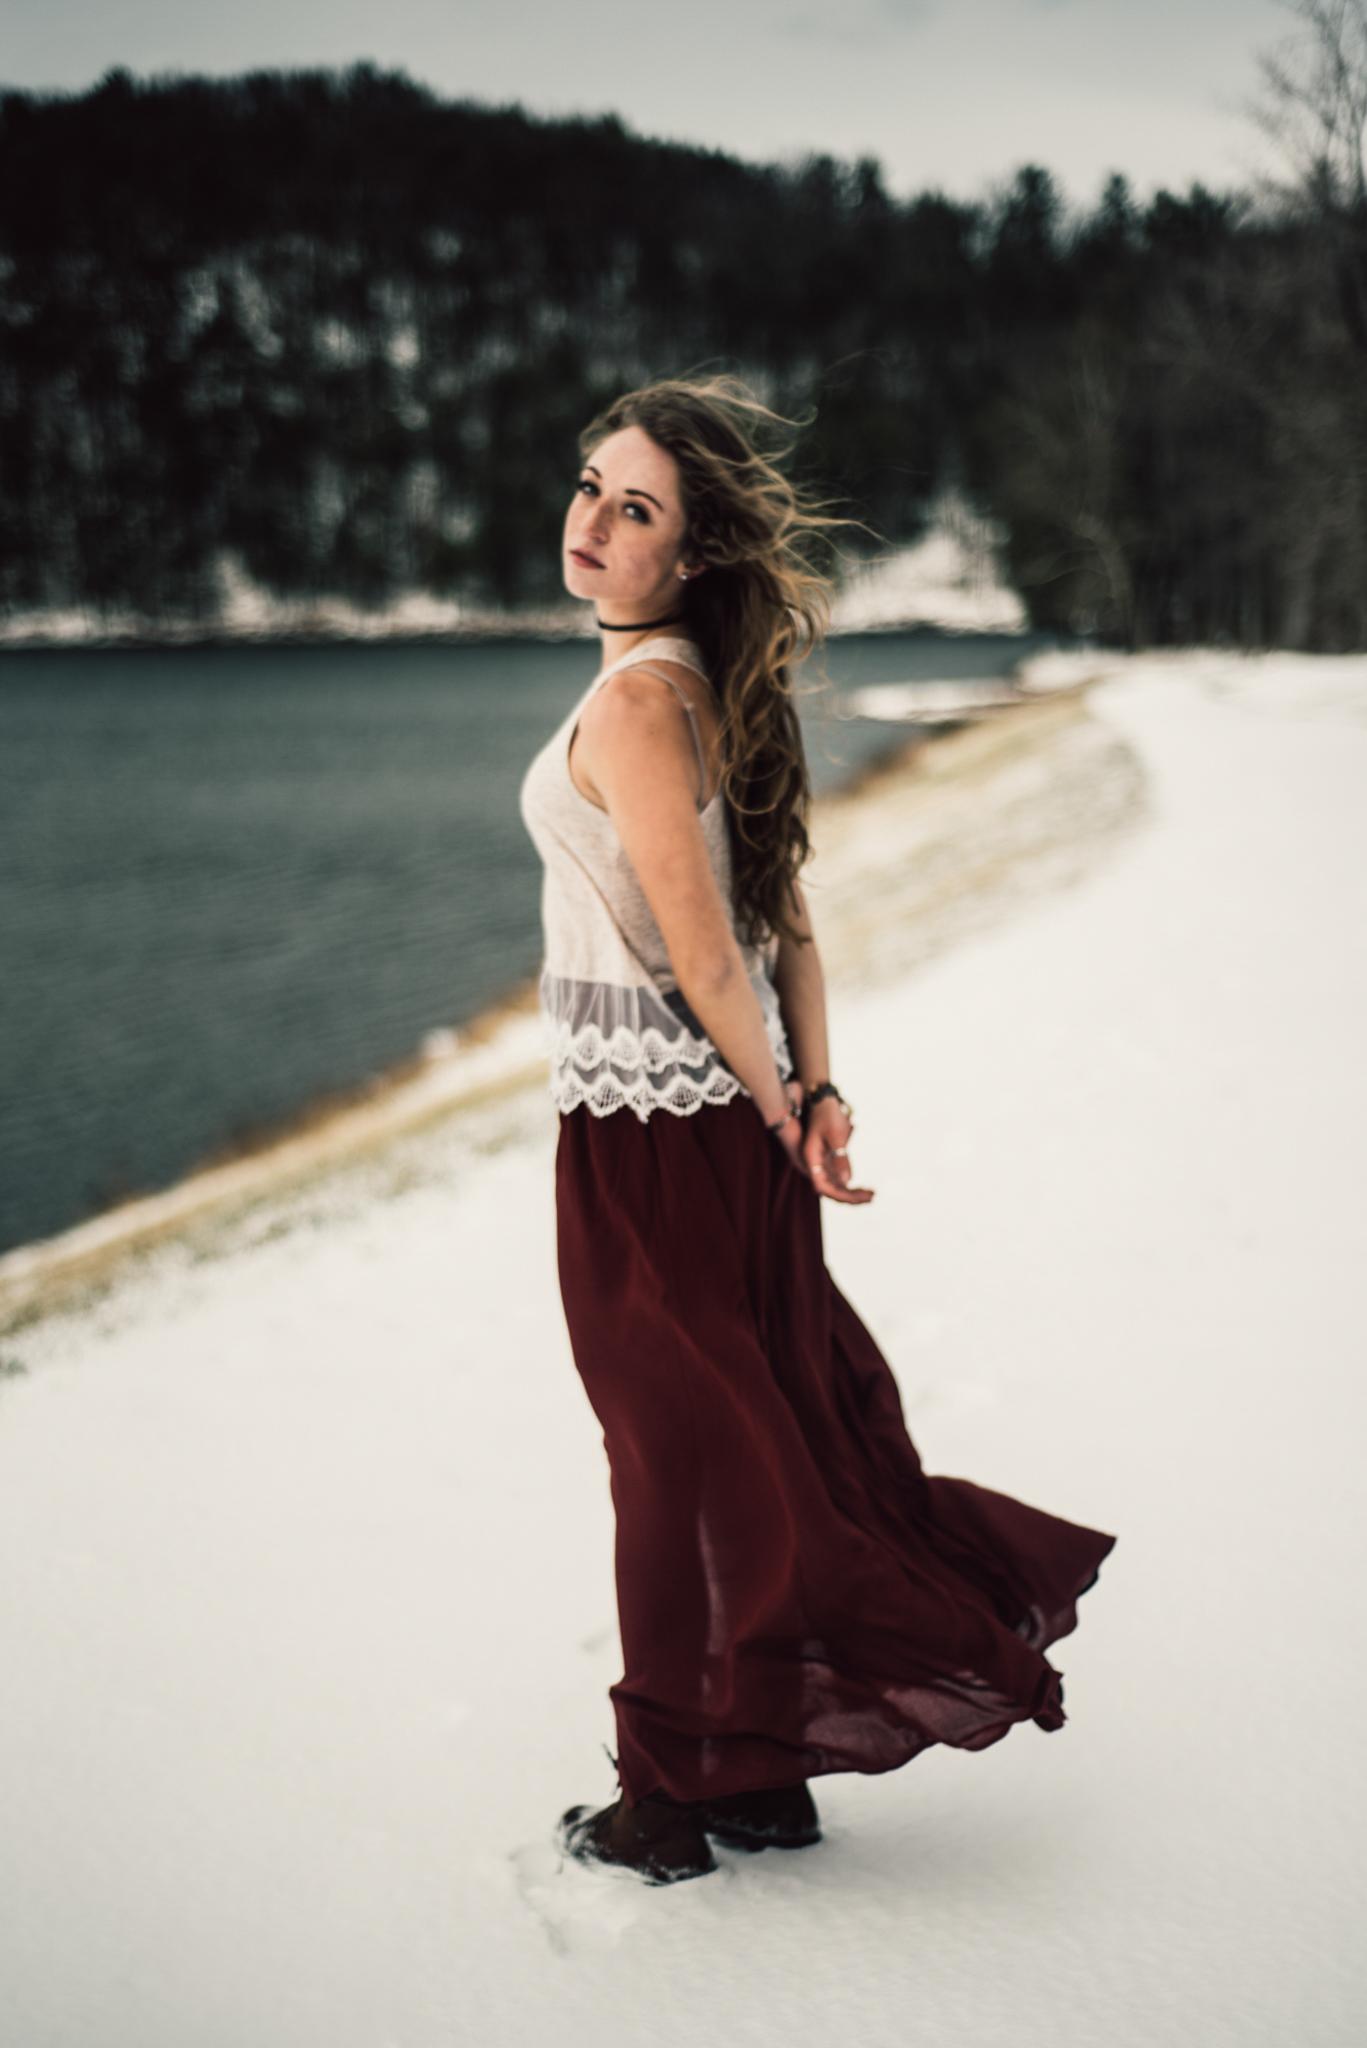 Moody Snowy Portrait Session at Lake Arrowhead in Luray Virginia_21.JPG